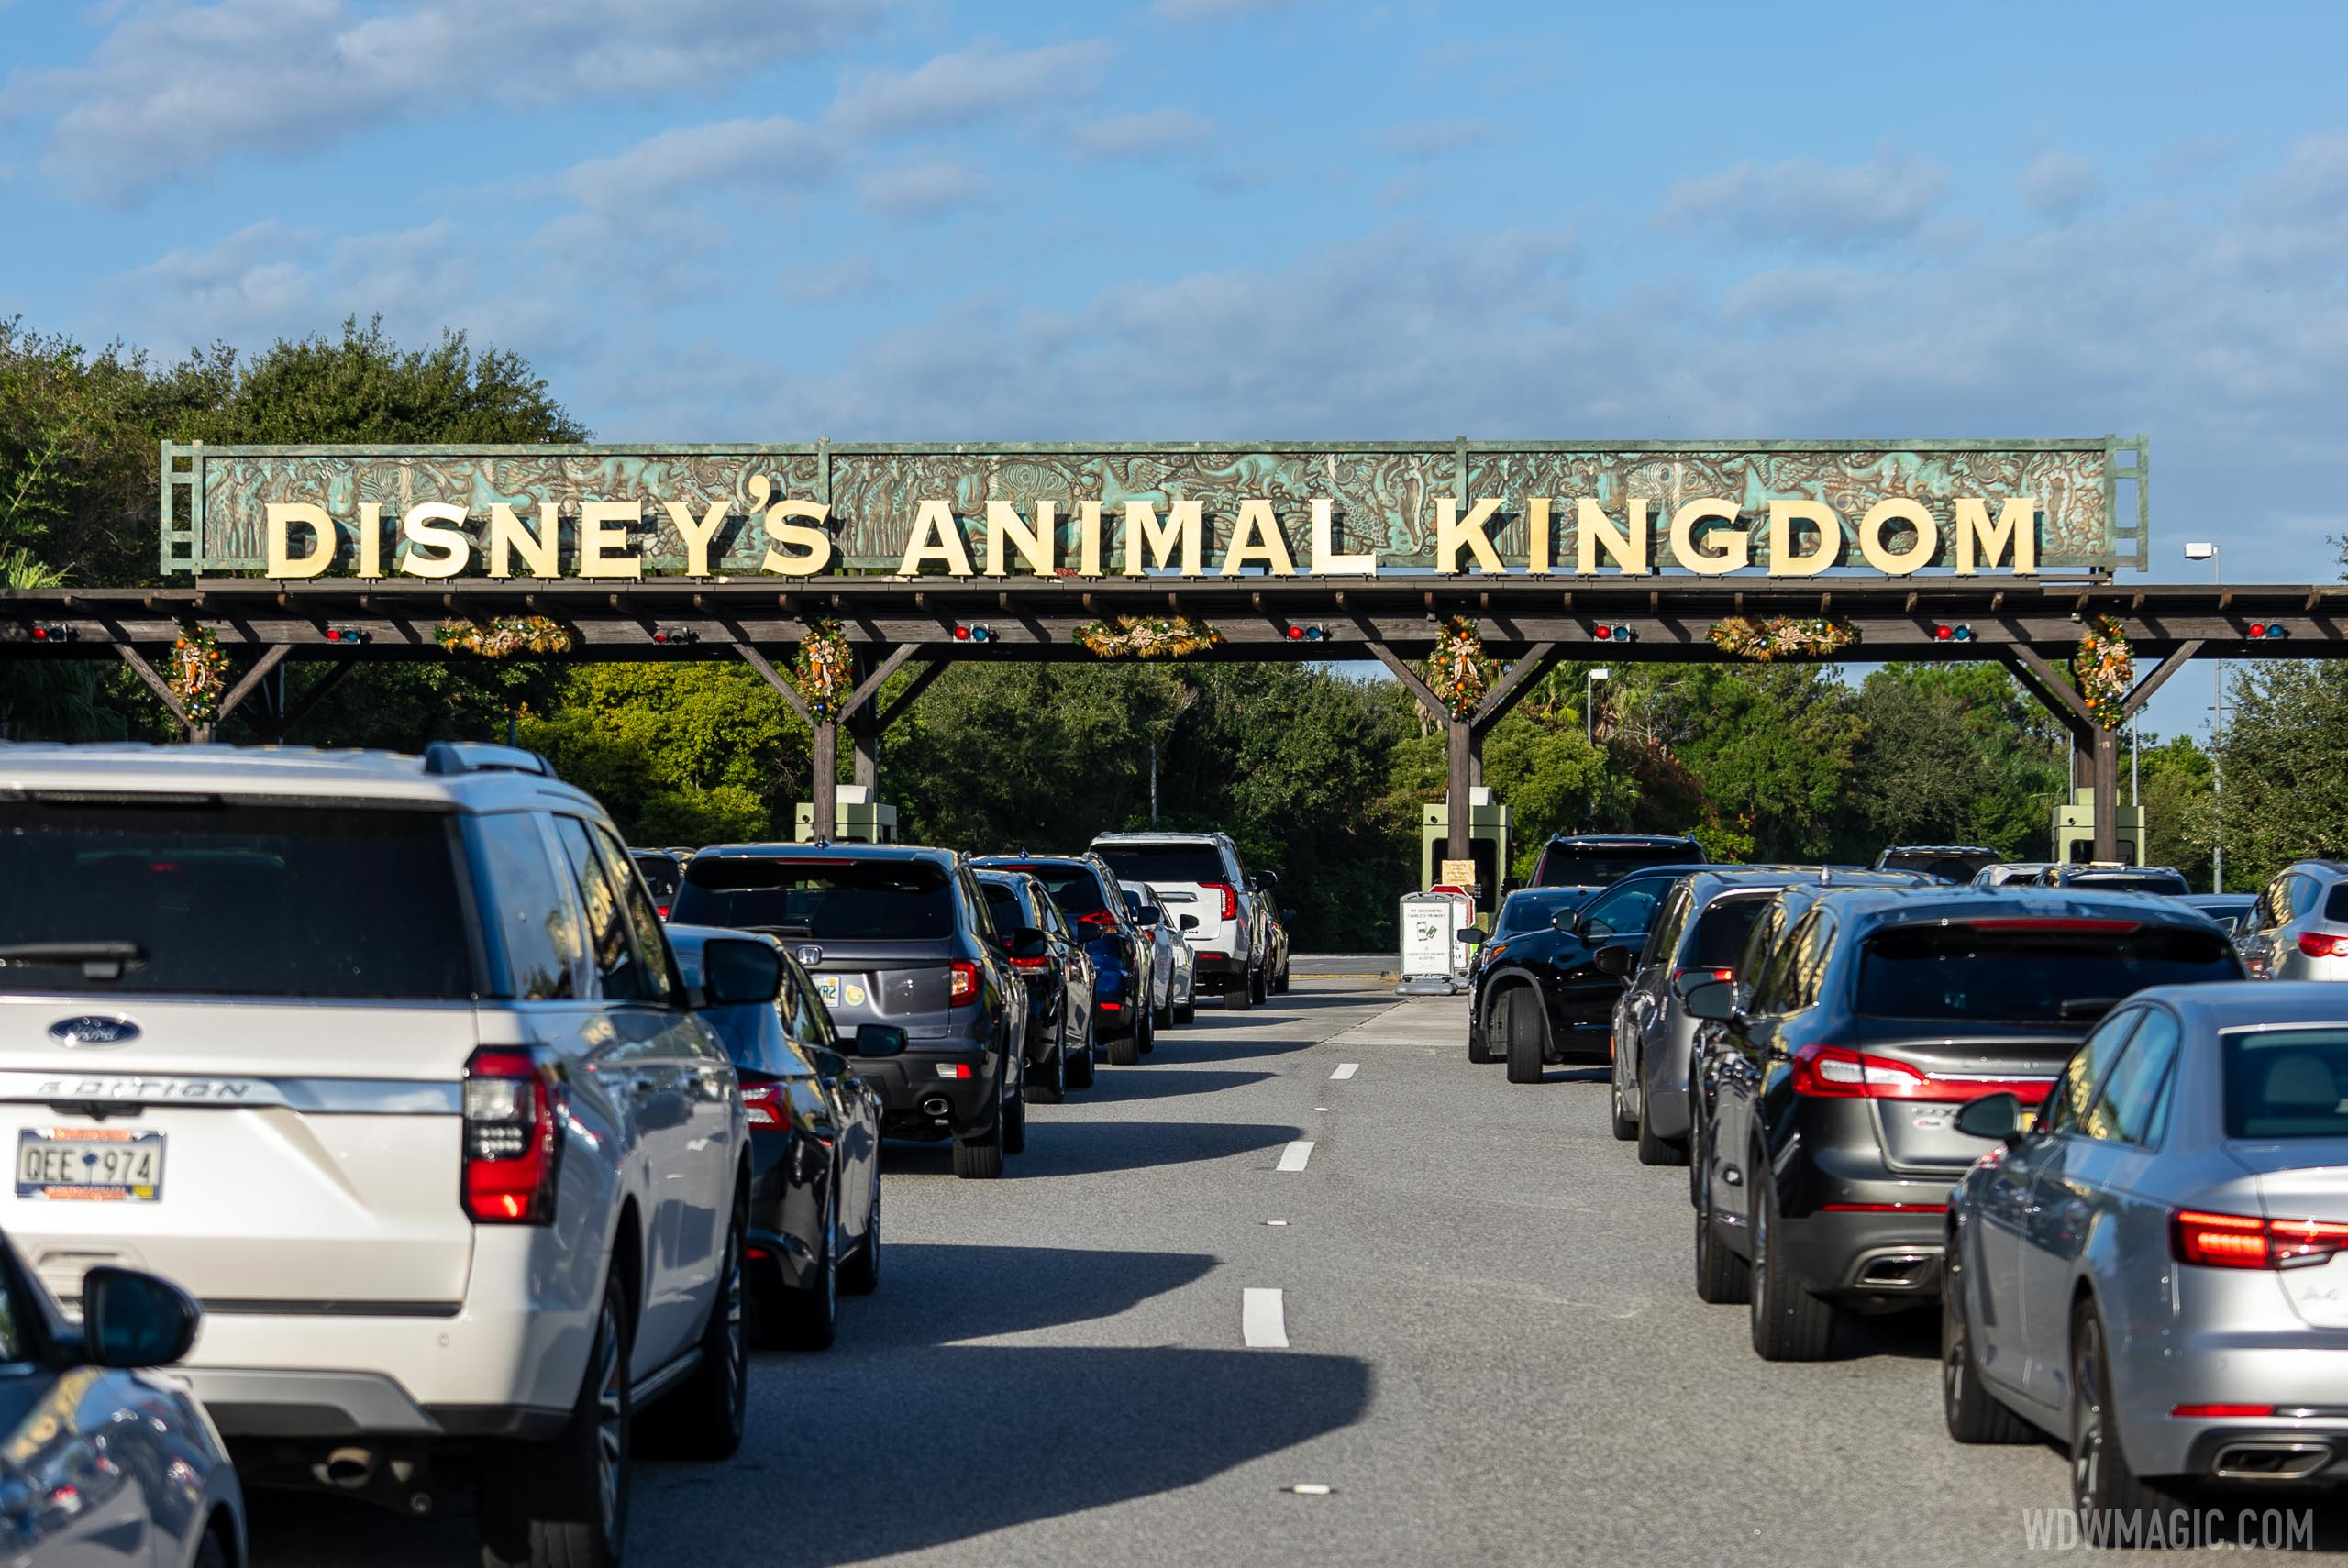 Disney's Animal Kingdom Christmas Holiday decor 2020